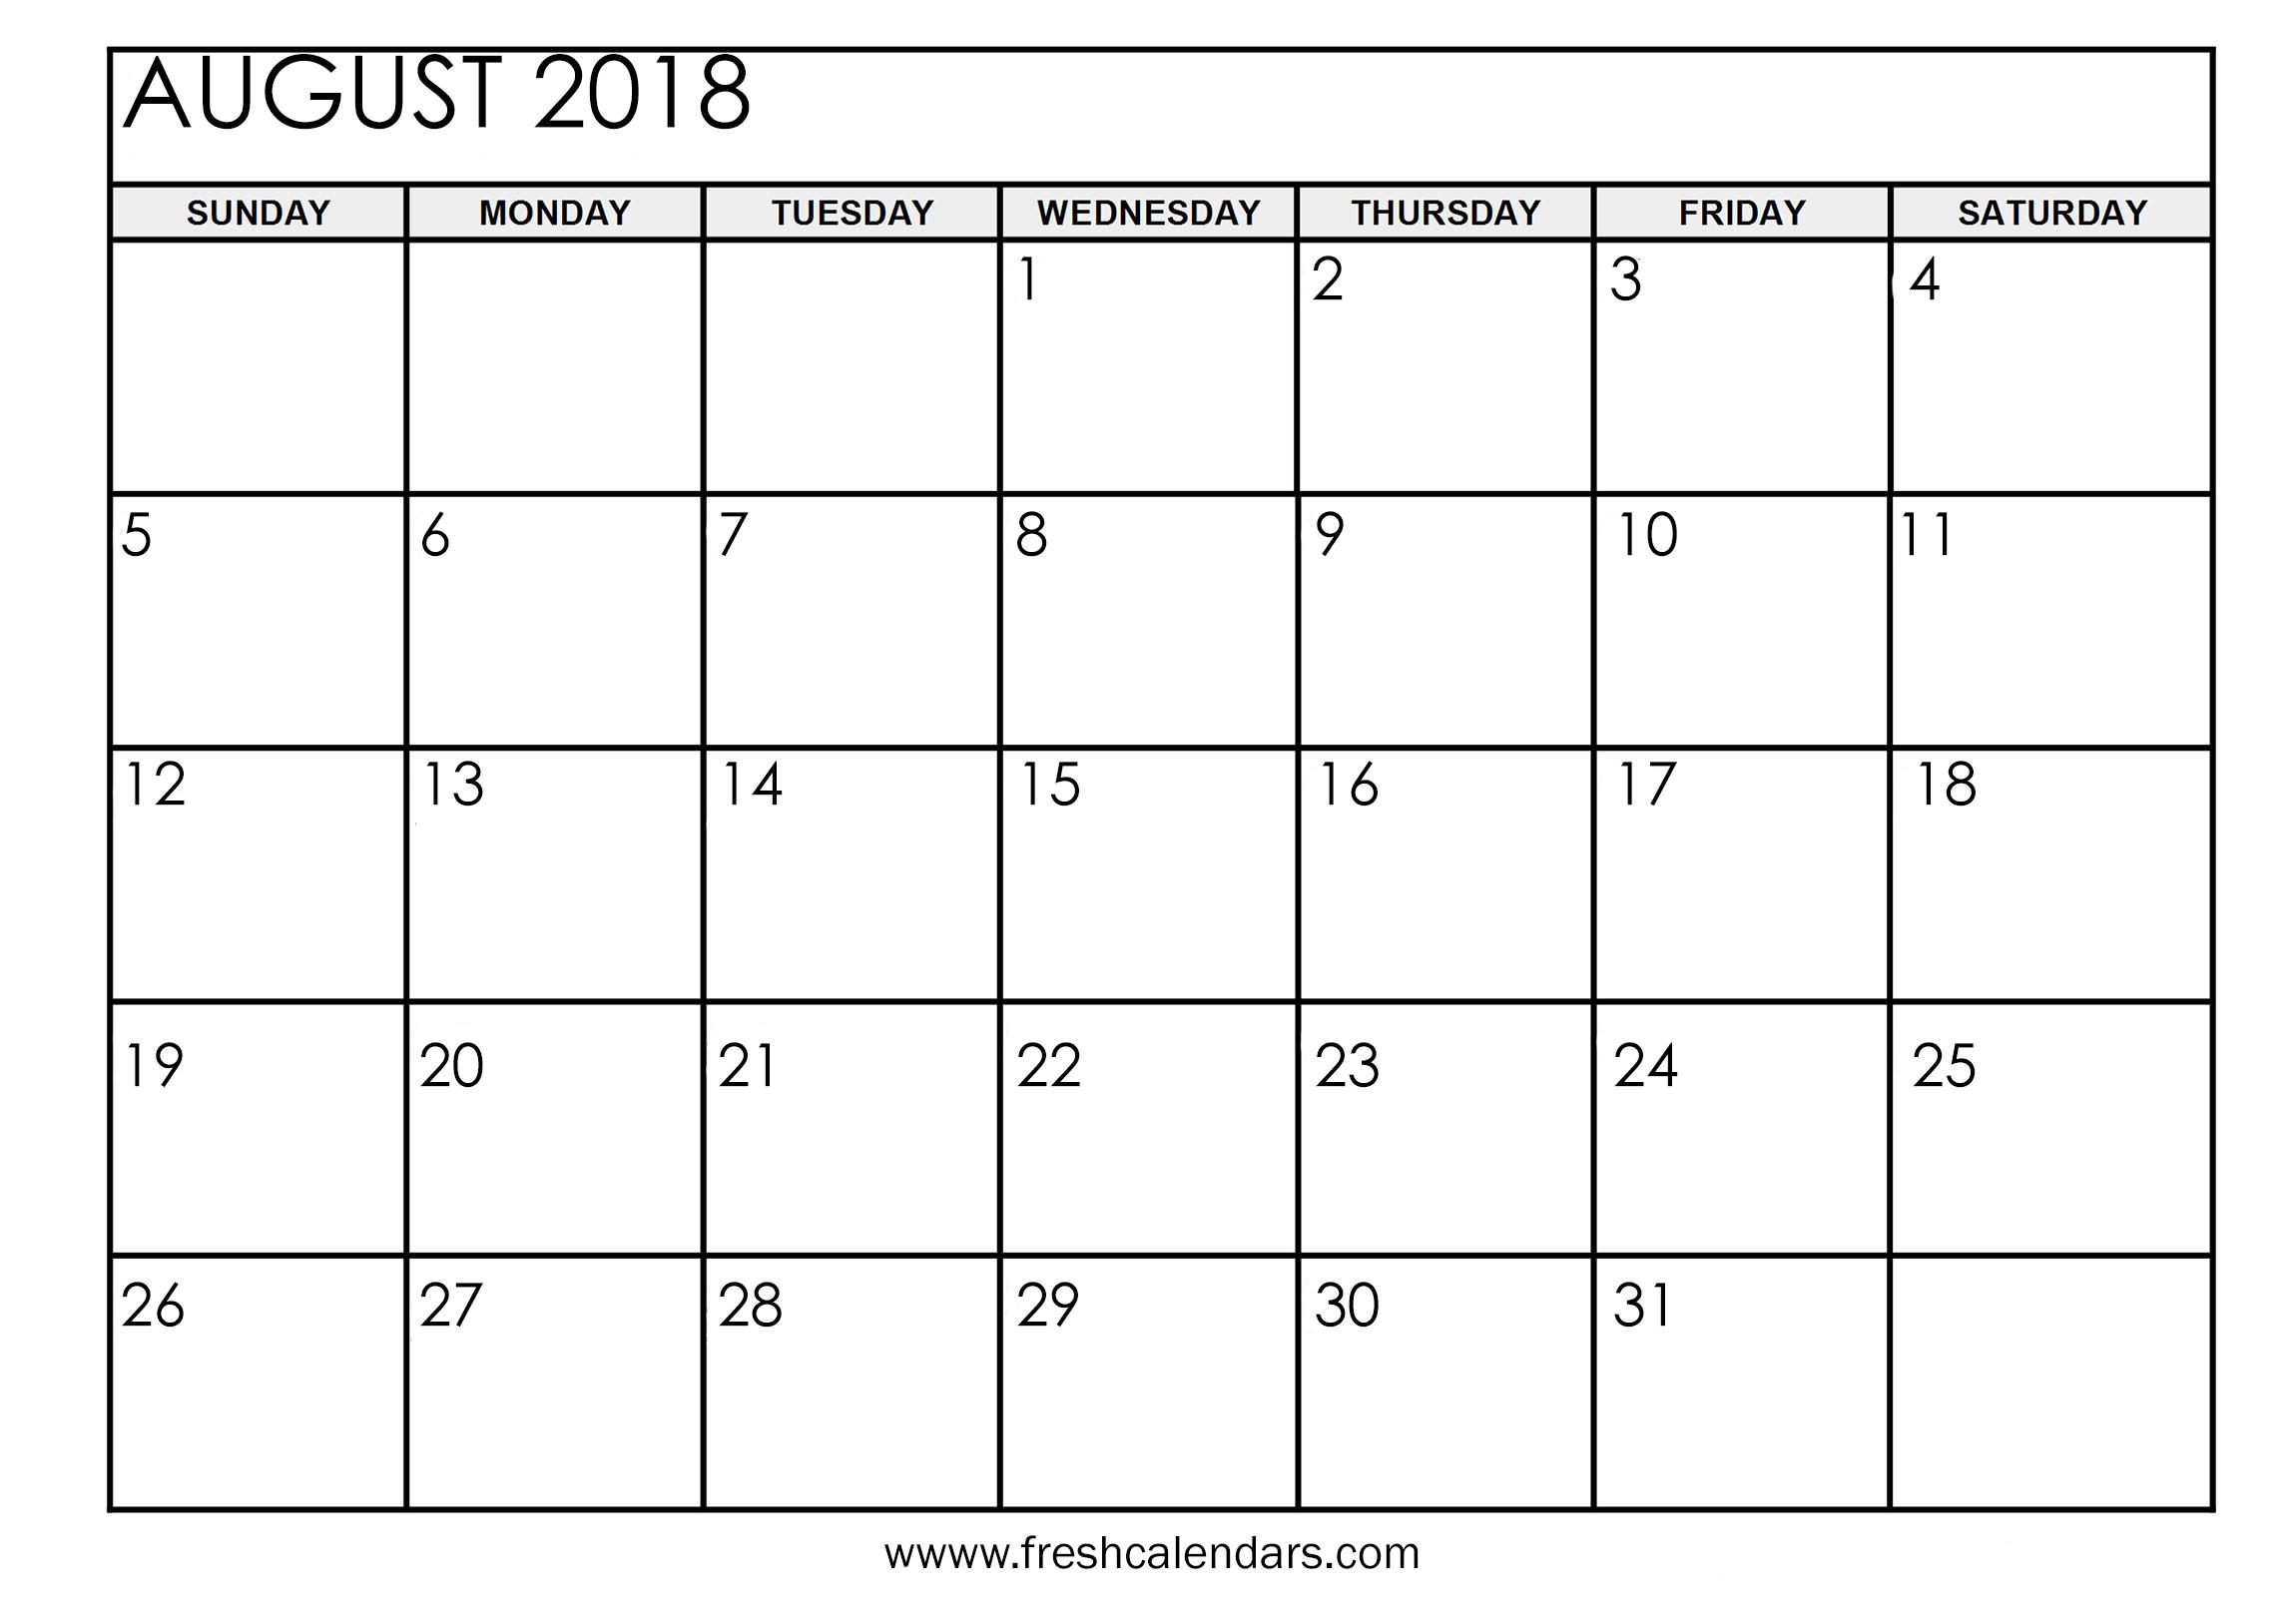 August Calendar 2018 - Free Printable Calendar, Blank Template, High with Aug Calendar Clip Art Template